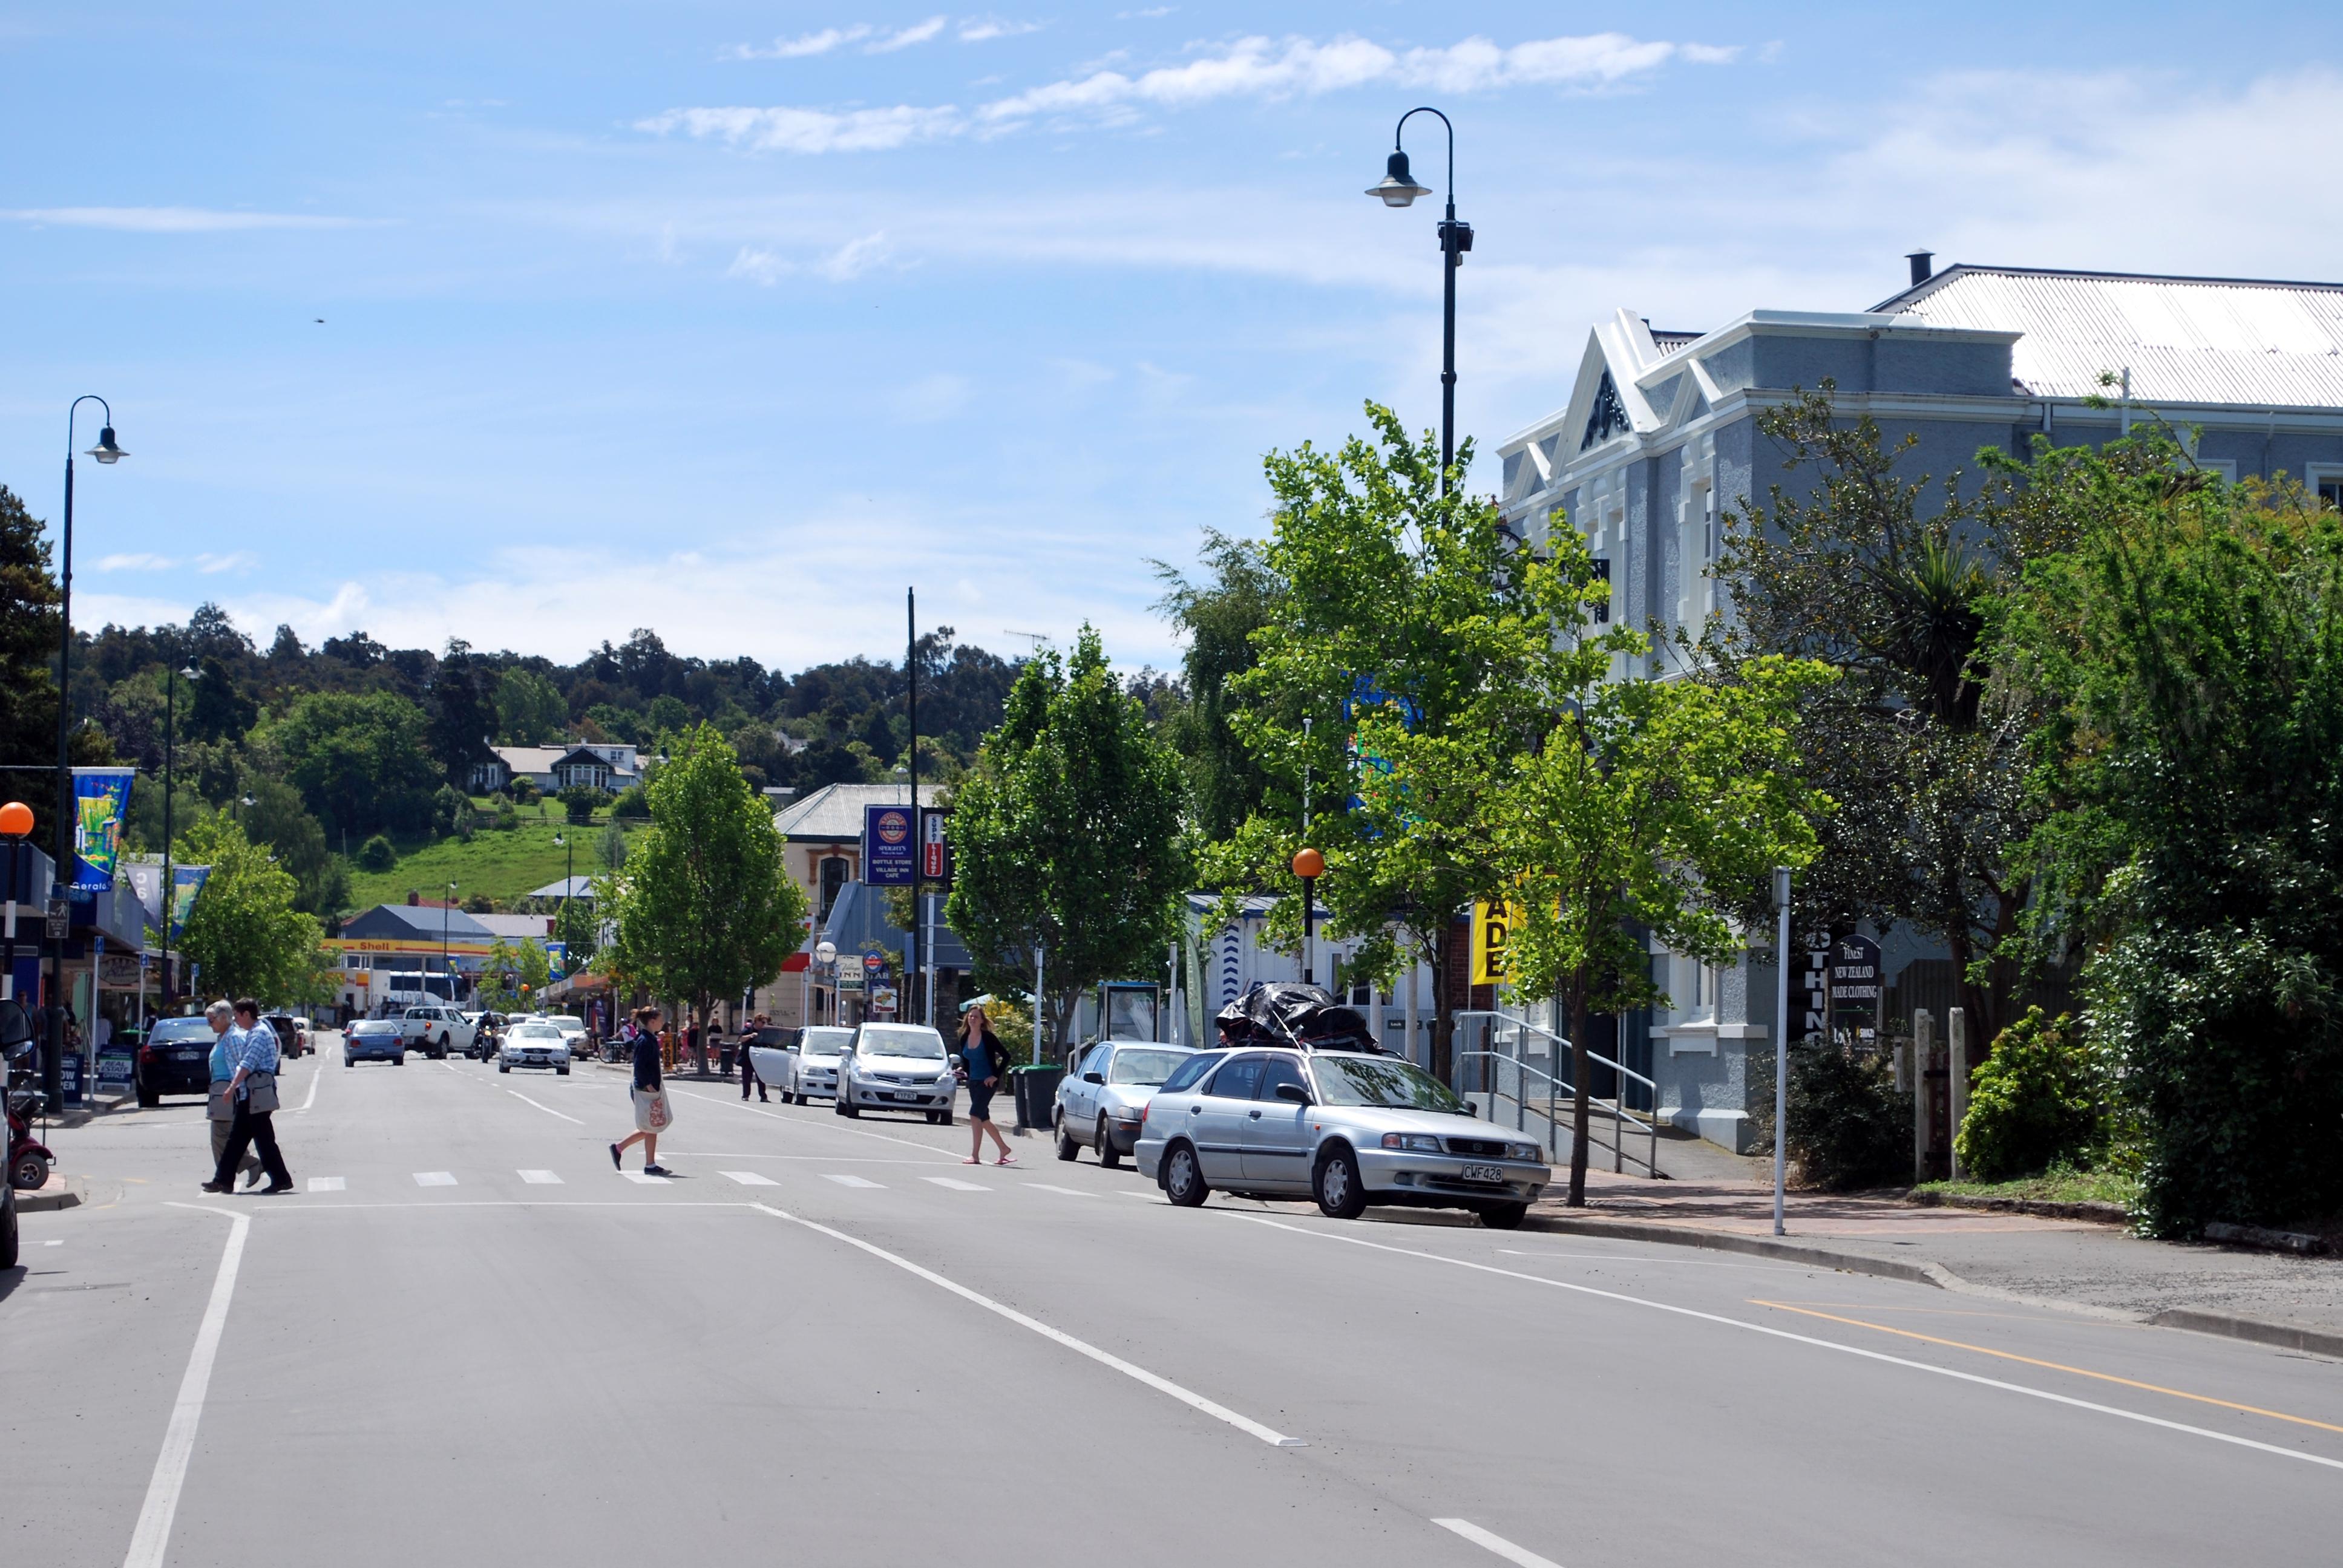 File:Geraldine Main Street 003.JPG - Wikimedia Commons